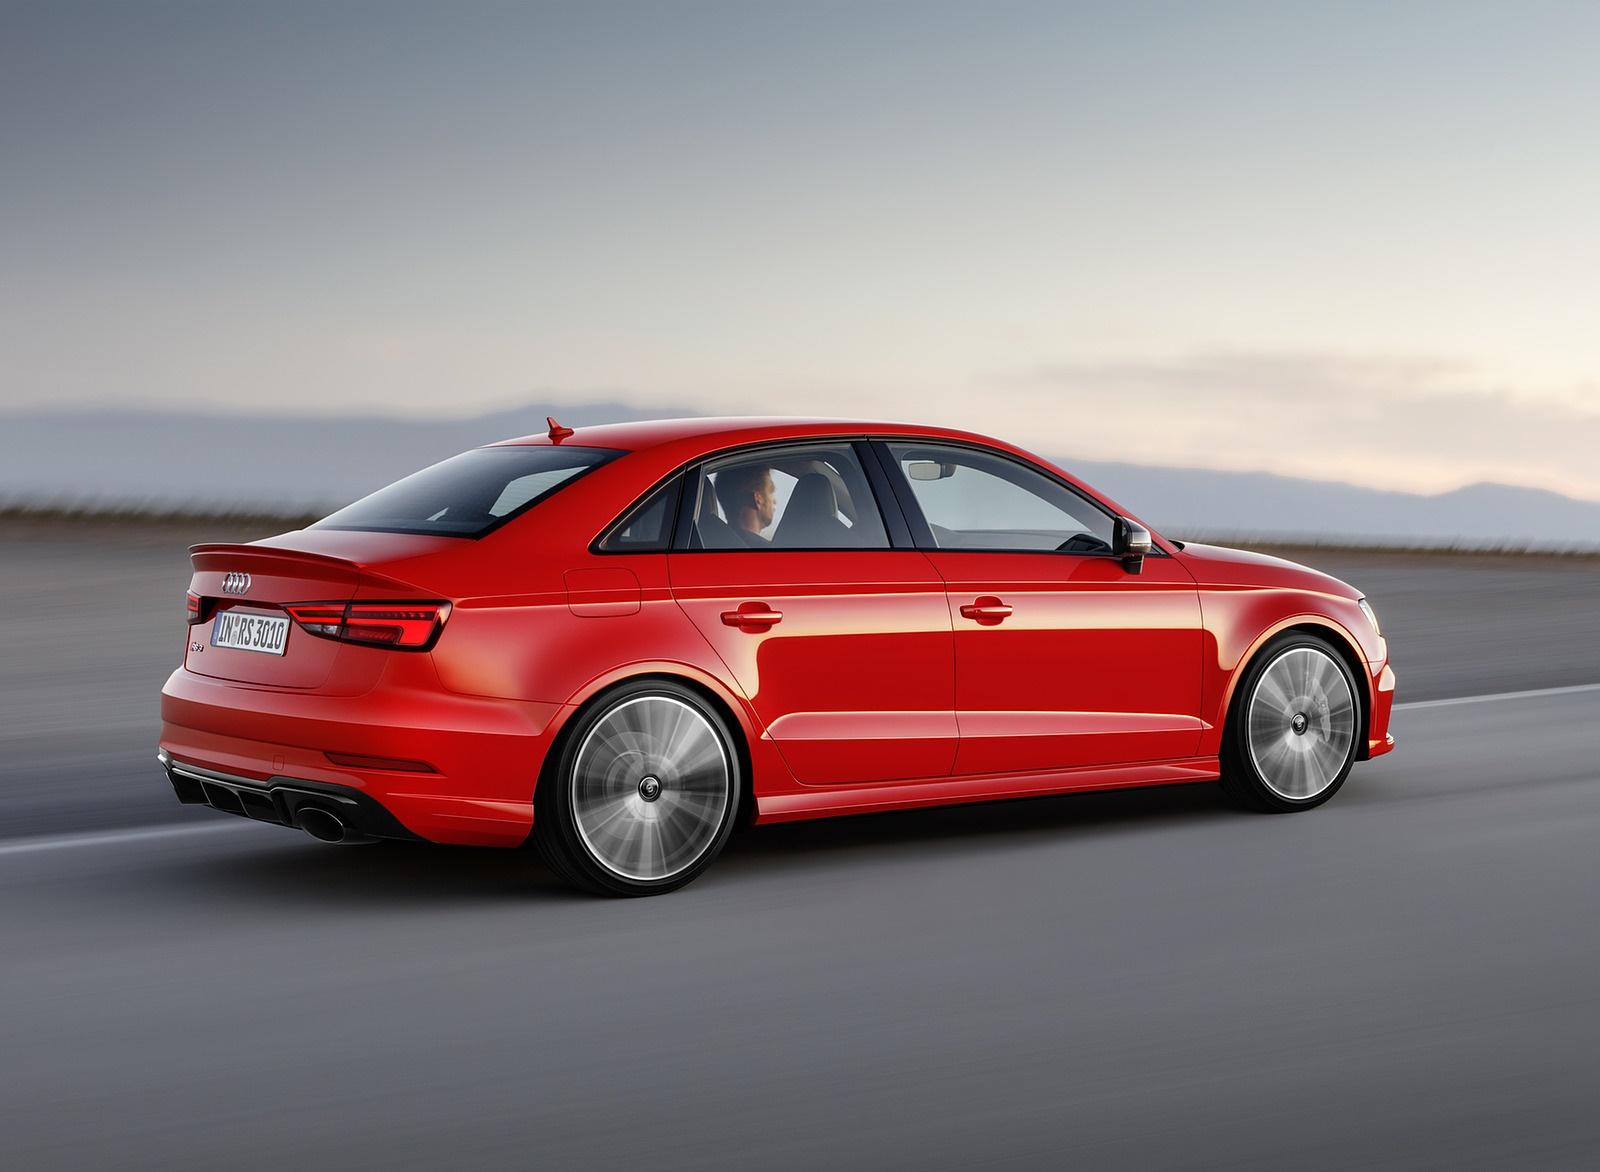 2018 Audi Rs3 Sedan Rear Three Quarter Wallpaper Audi Rs3 Sedan 2018 White 2179080 Hd Wallpaper Backgrounds Download